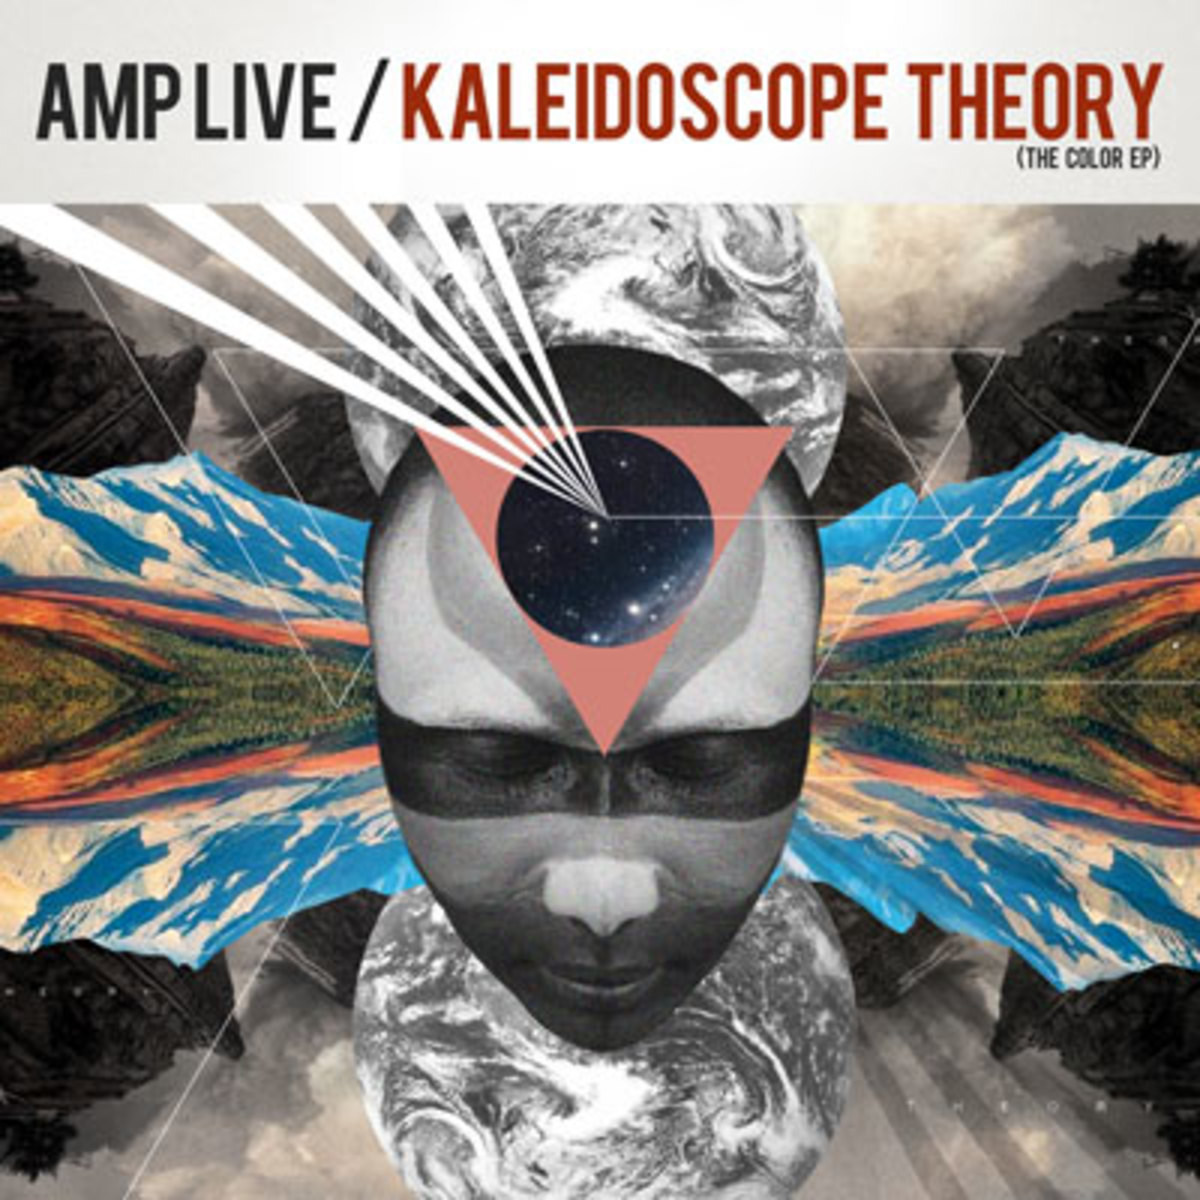 amplive-kaltheory.jpg